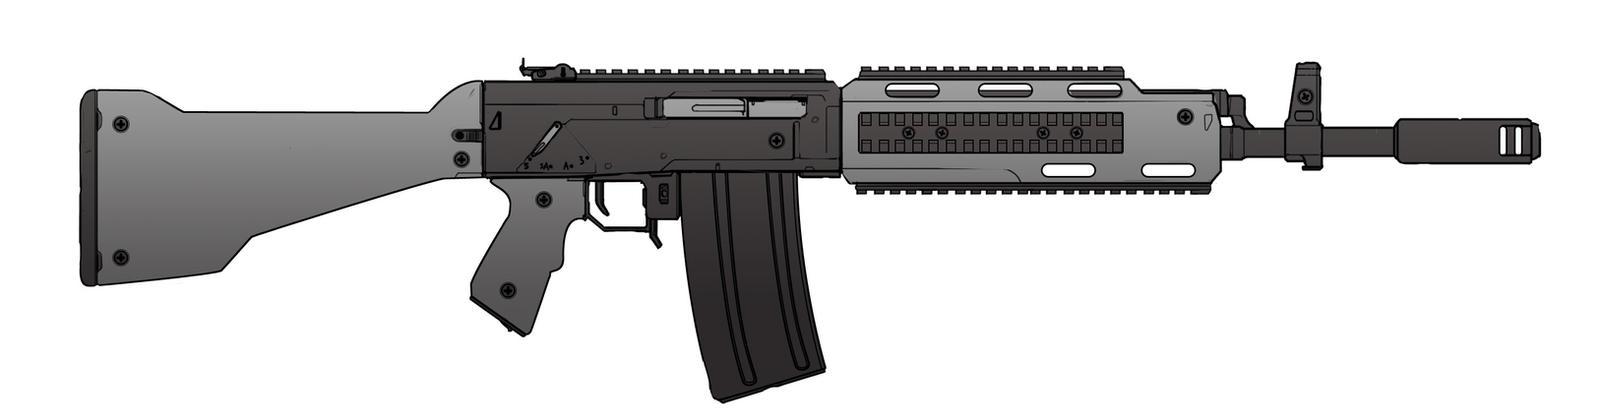 AV-111 Assault Rifle by dfacto